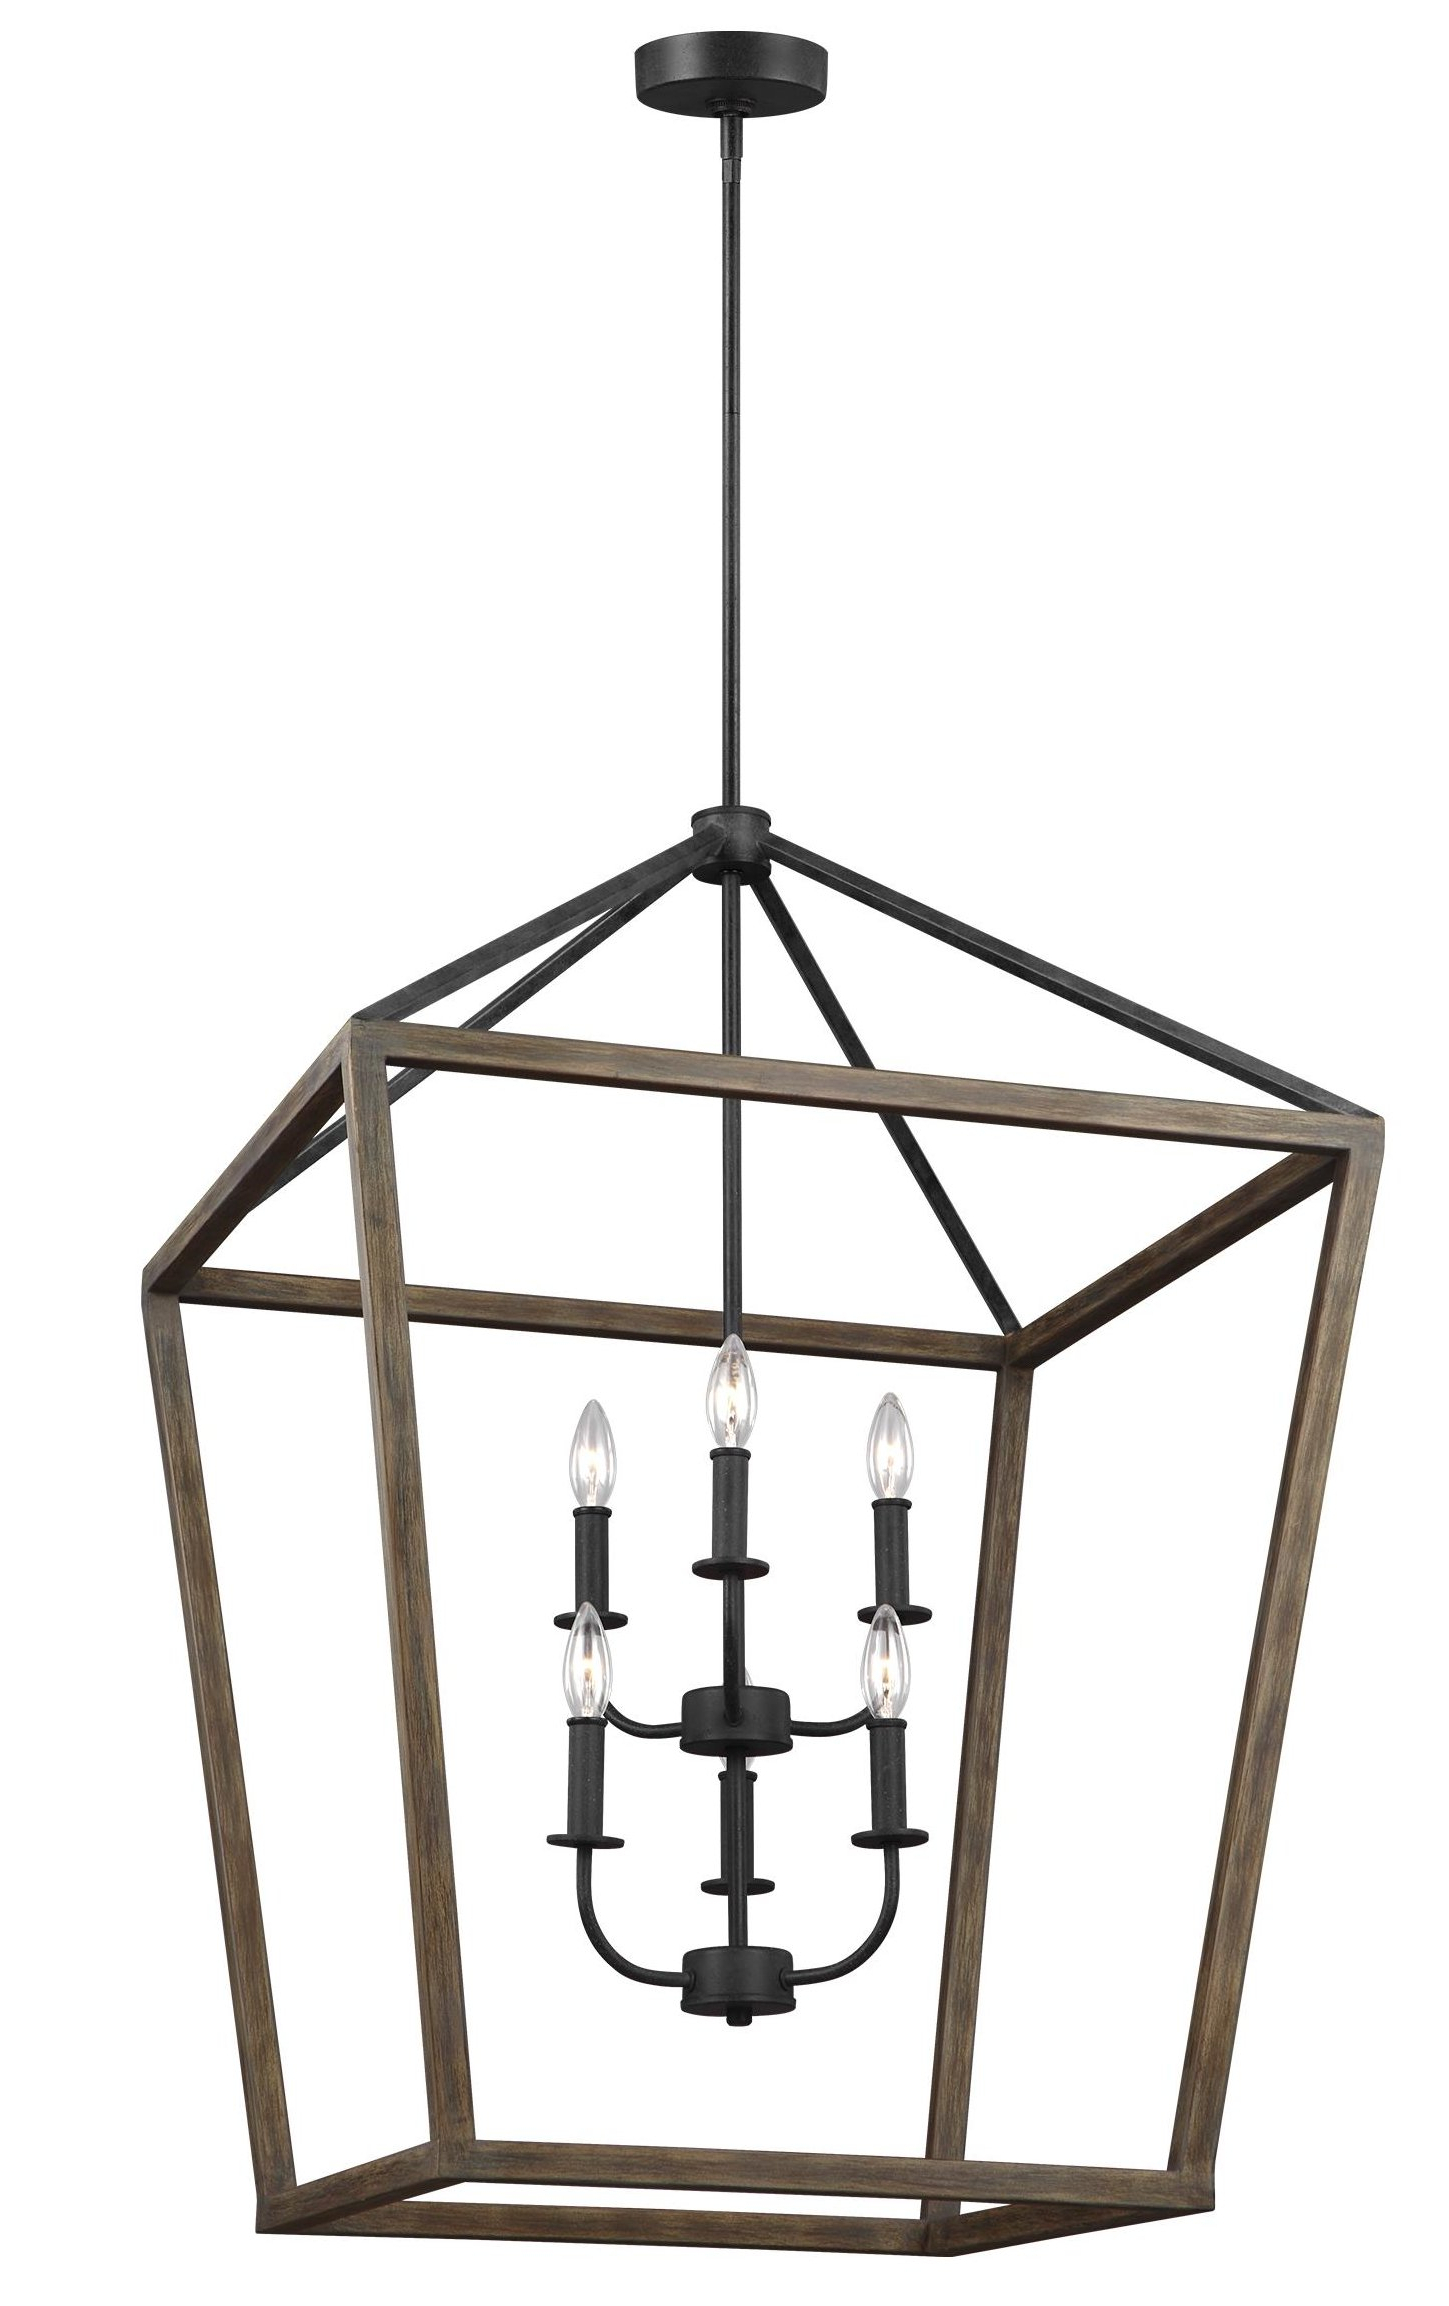 2020 Natarsha 6 Light Lantern Geometric Pendant Regarding Carmen 8 Light Lantern Geometric Pendants (View 22 of 25)